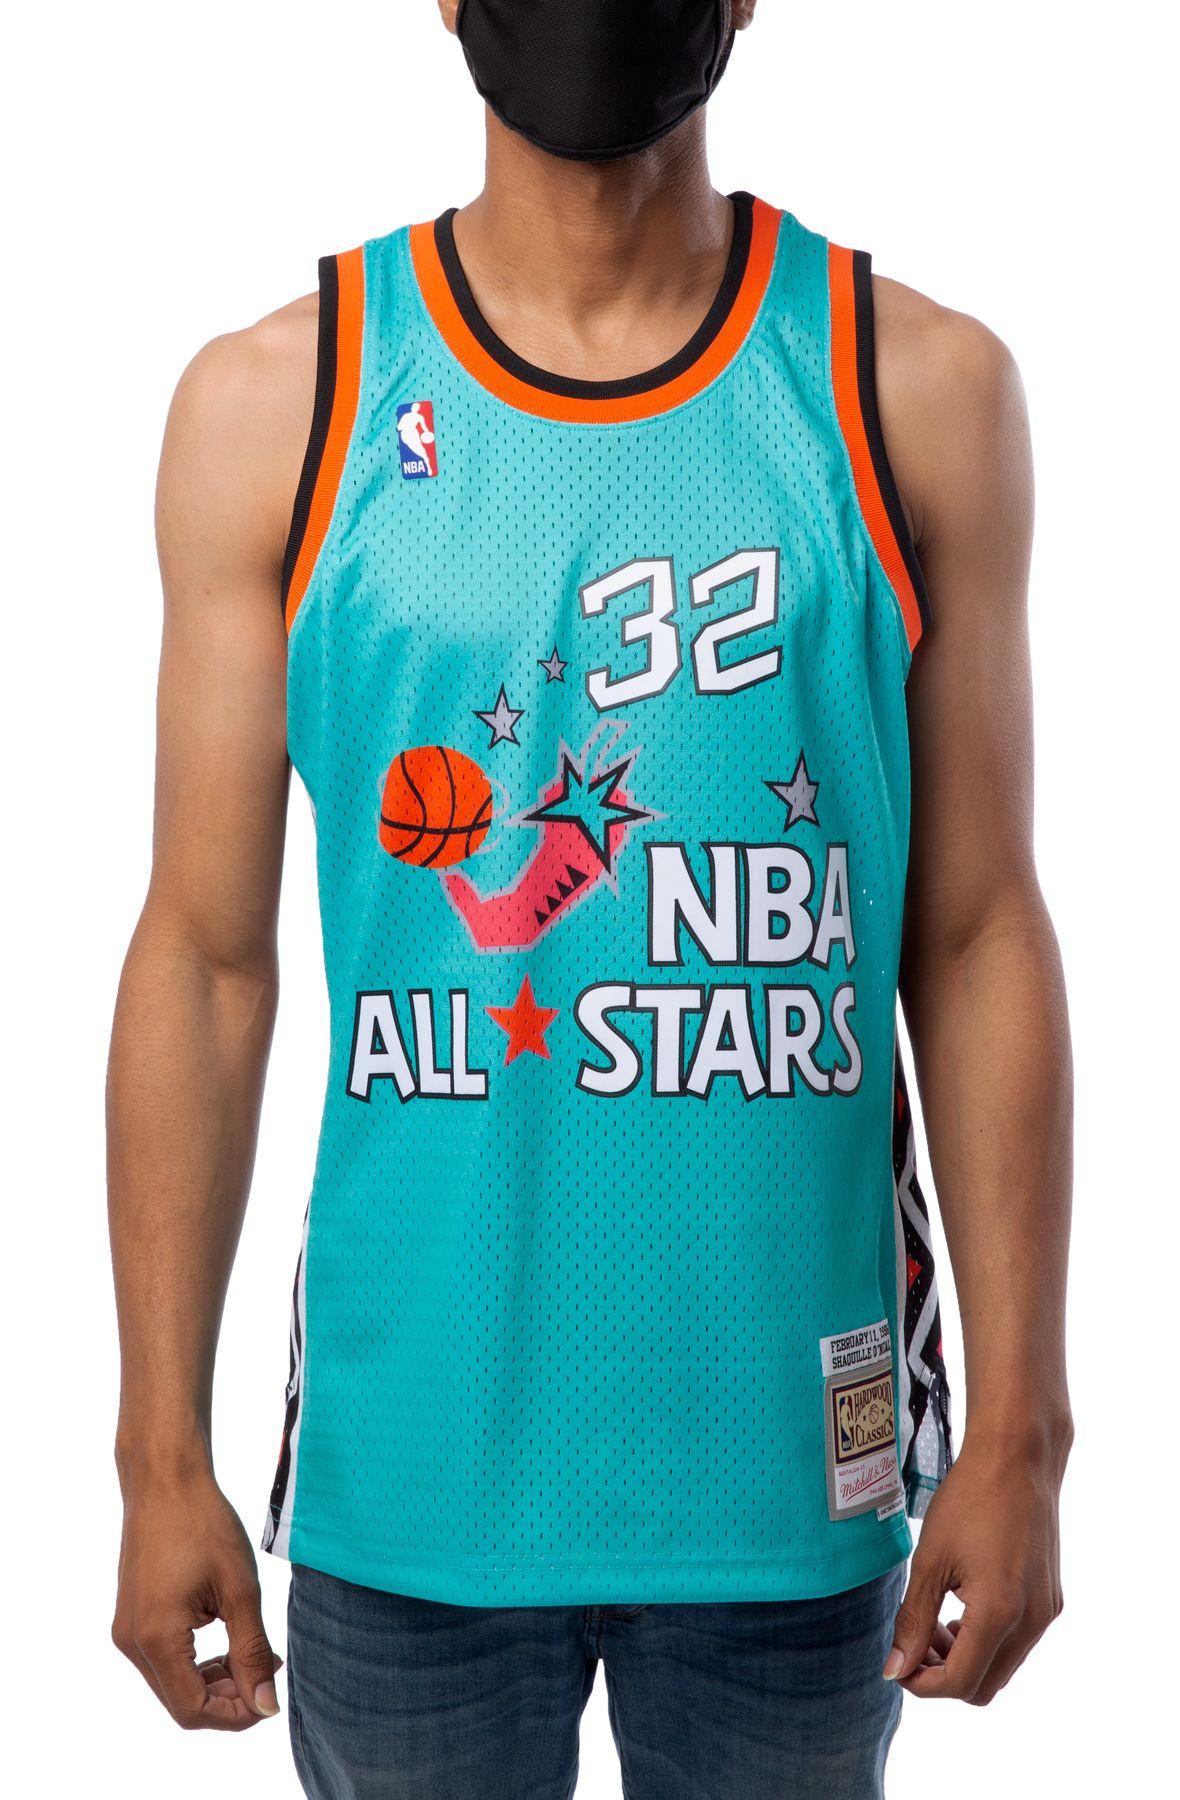 All-Star East Shaquille O'Neal 1996-97 Swingman Jersey